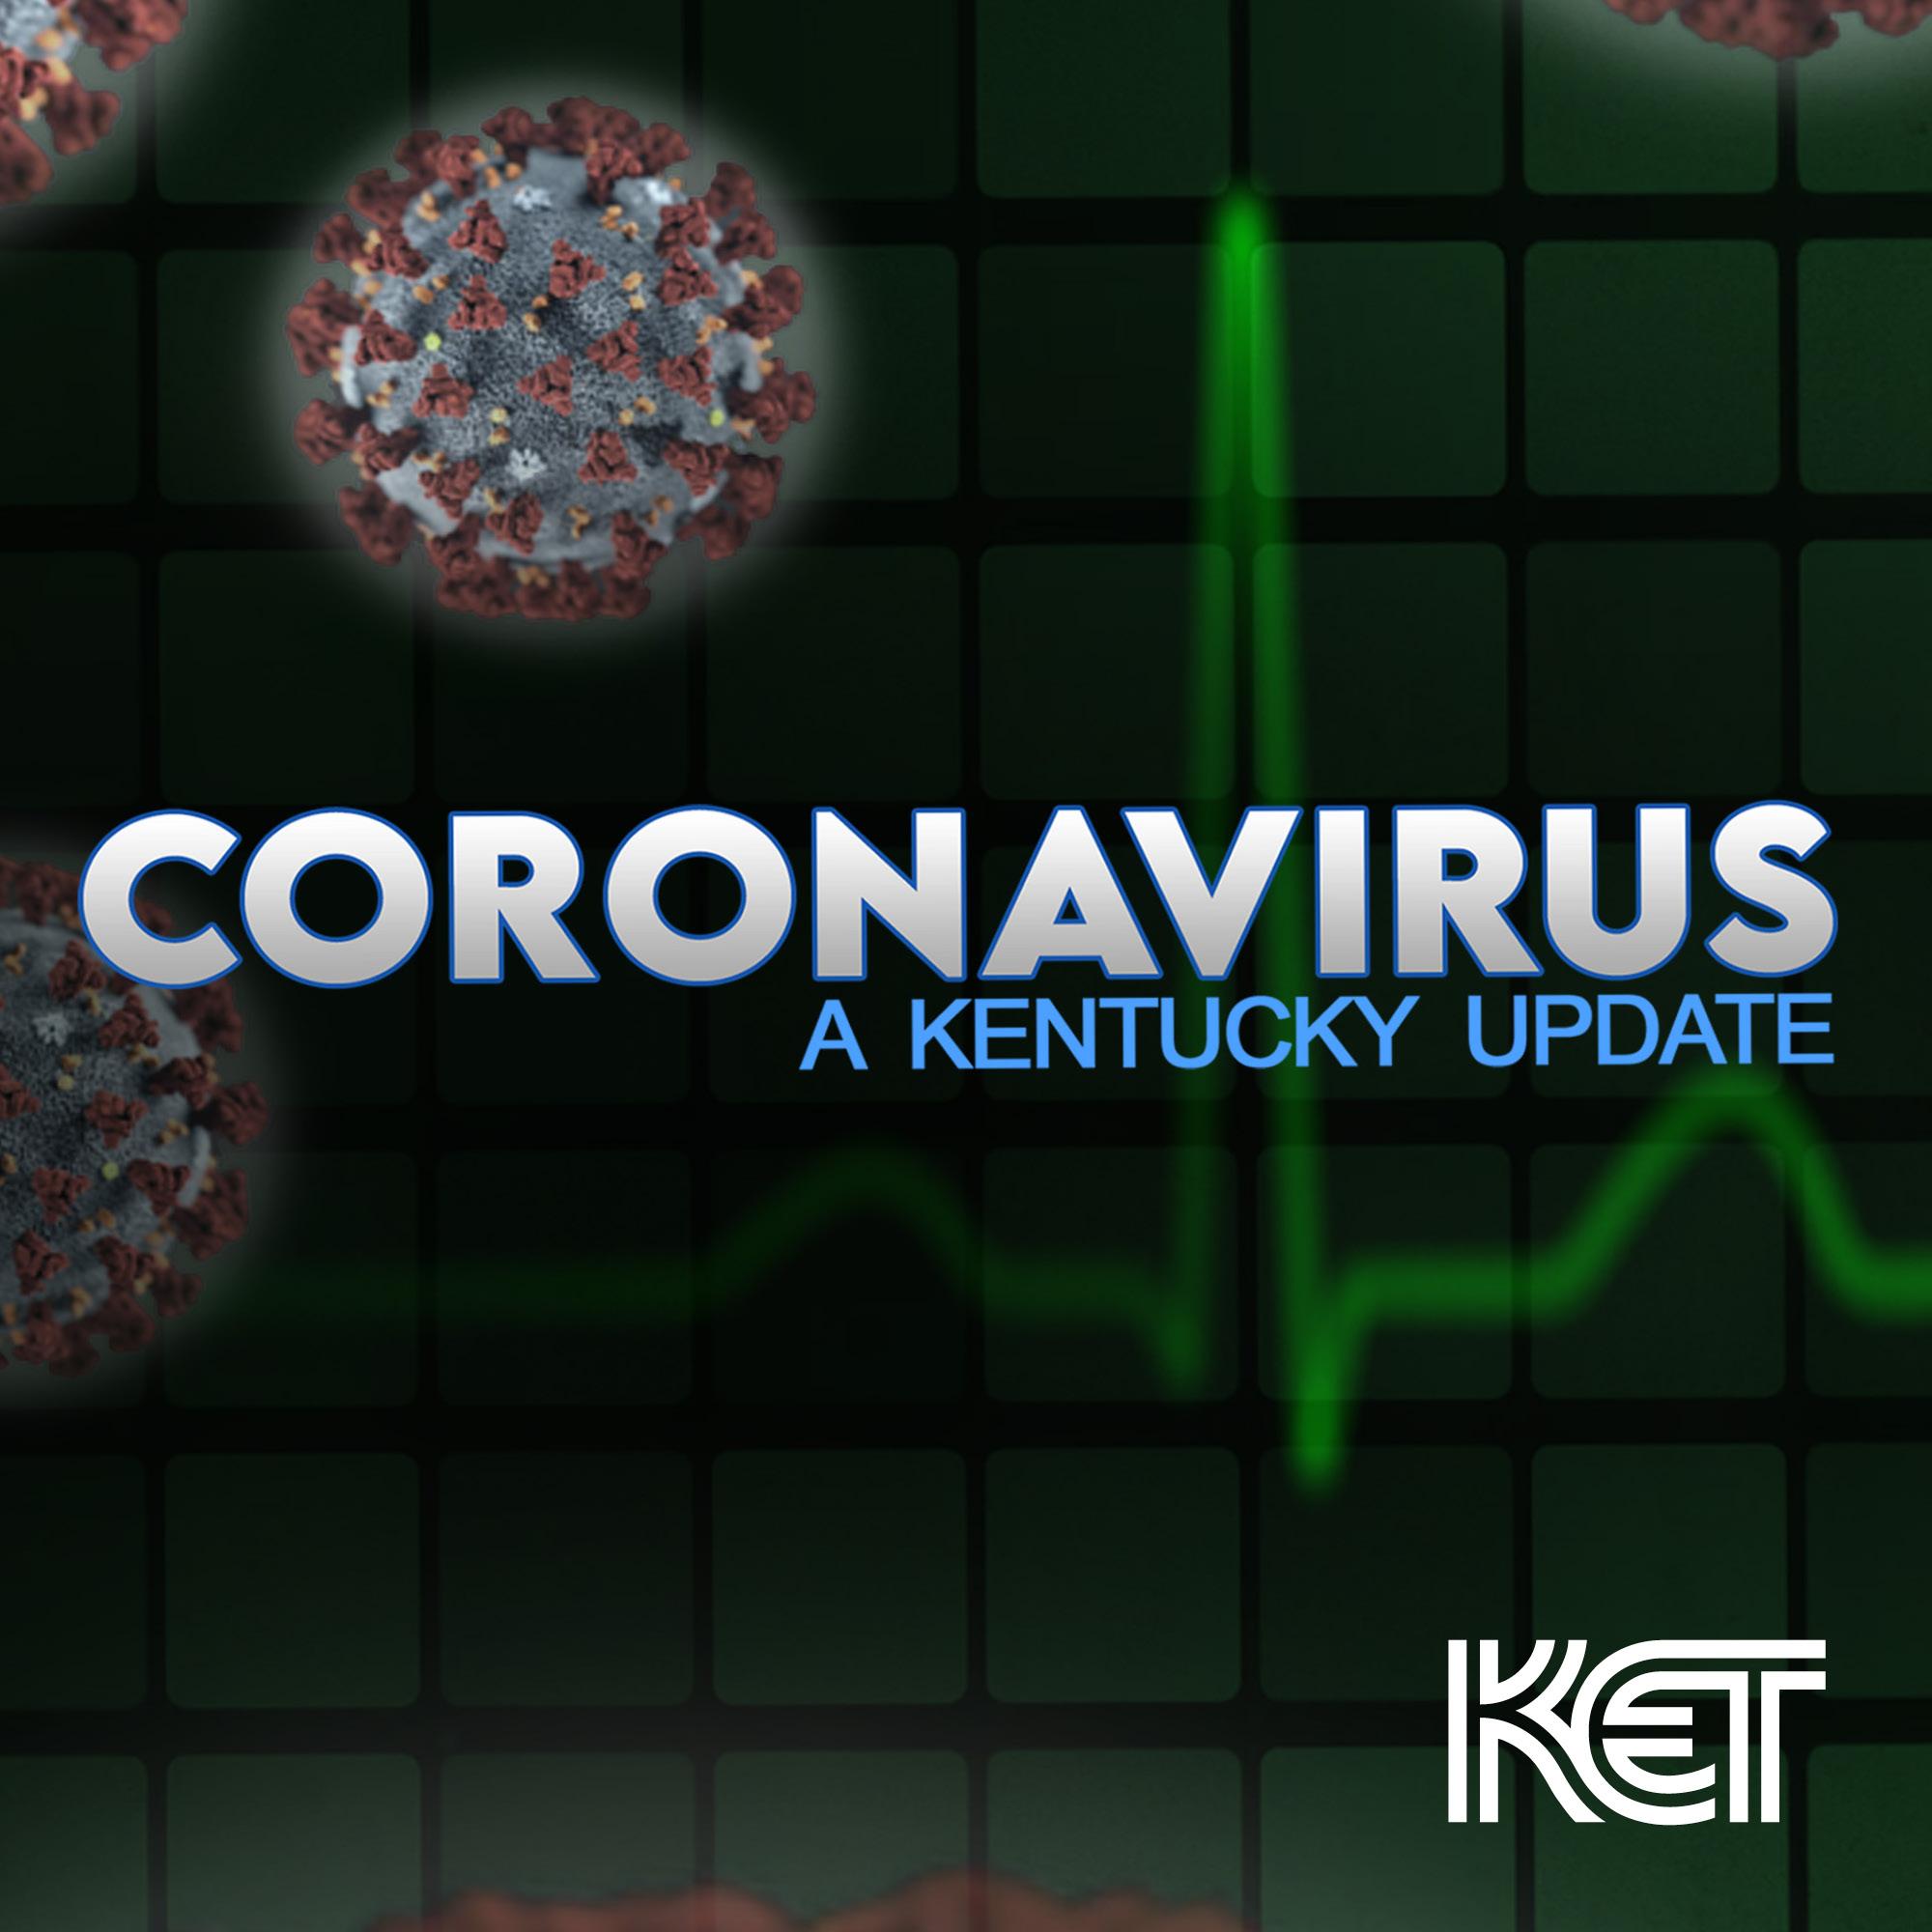 Coronavirus: A Kentucky Update